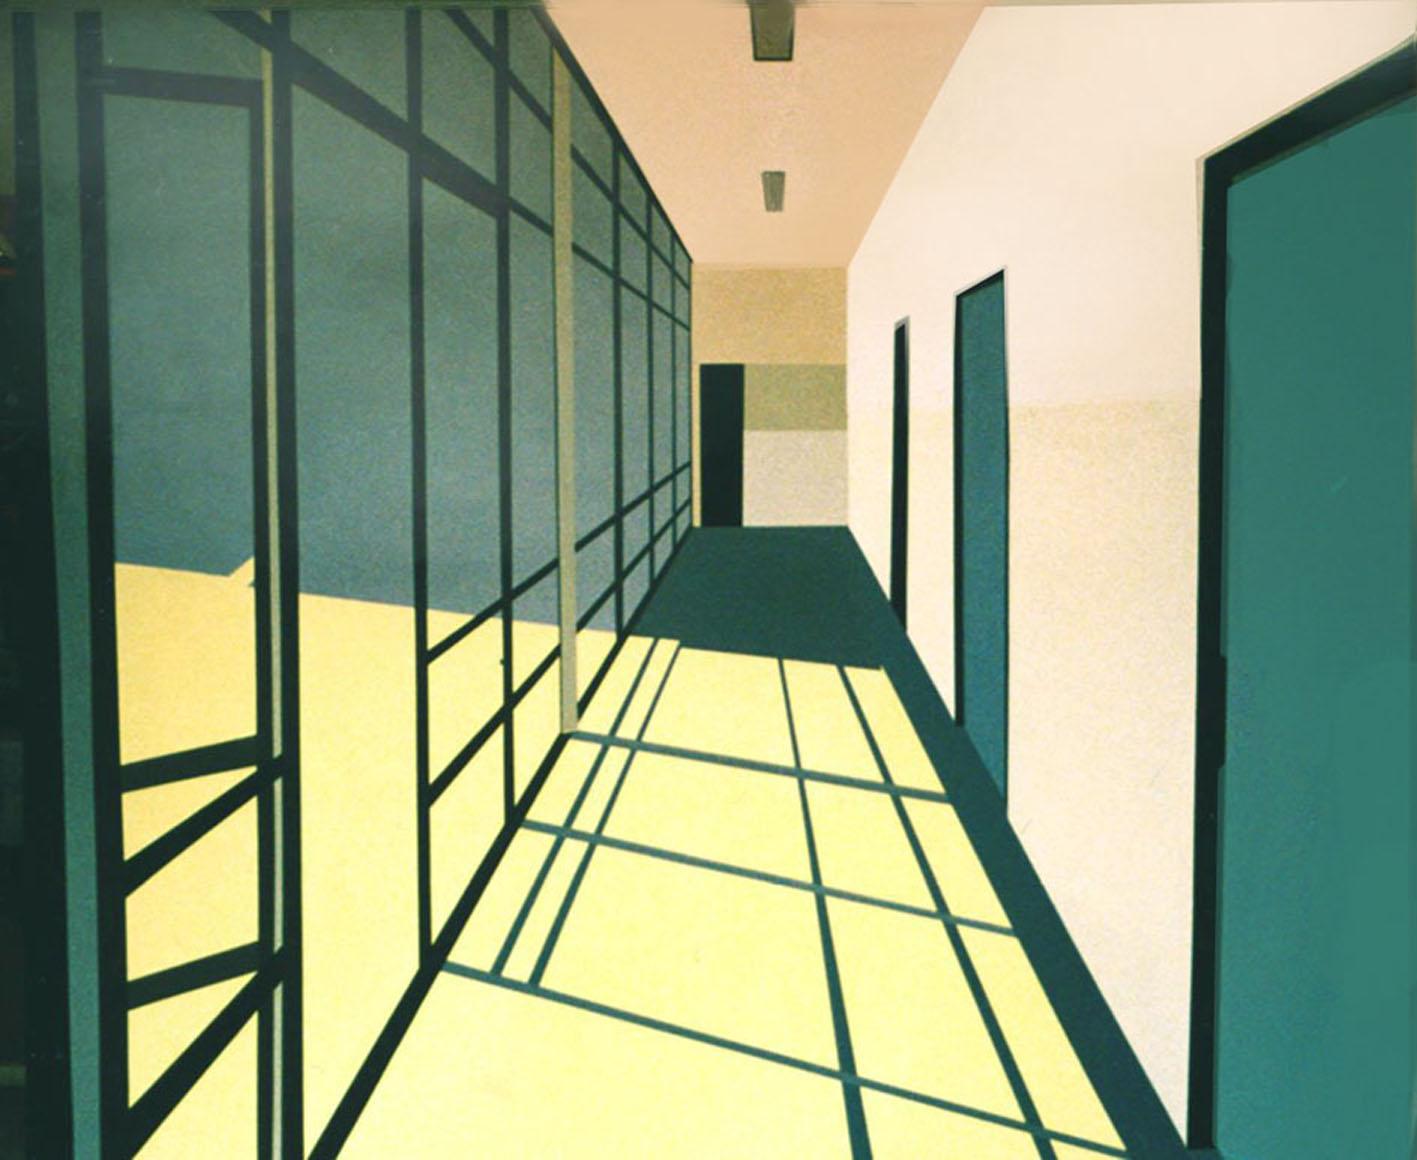 [Carina+Traberg,+Corridor+with+Window,+acrylic+on+canvas,+120x100cm,+2002]